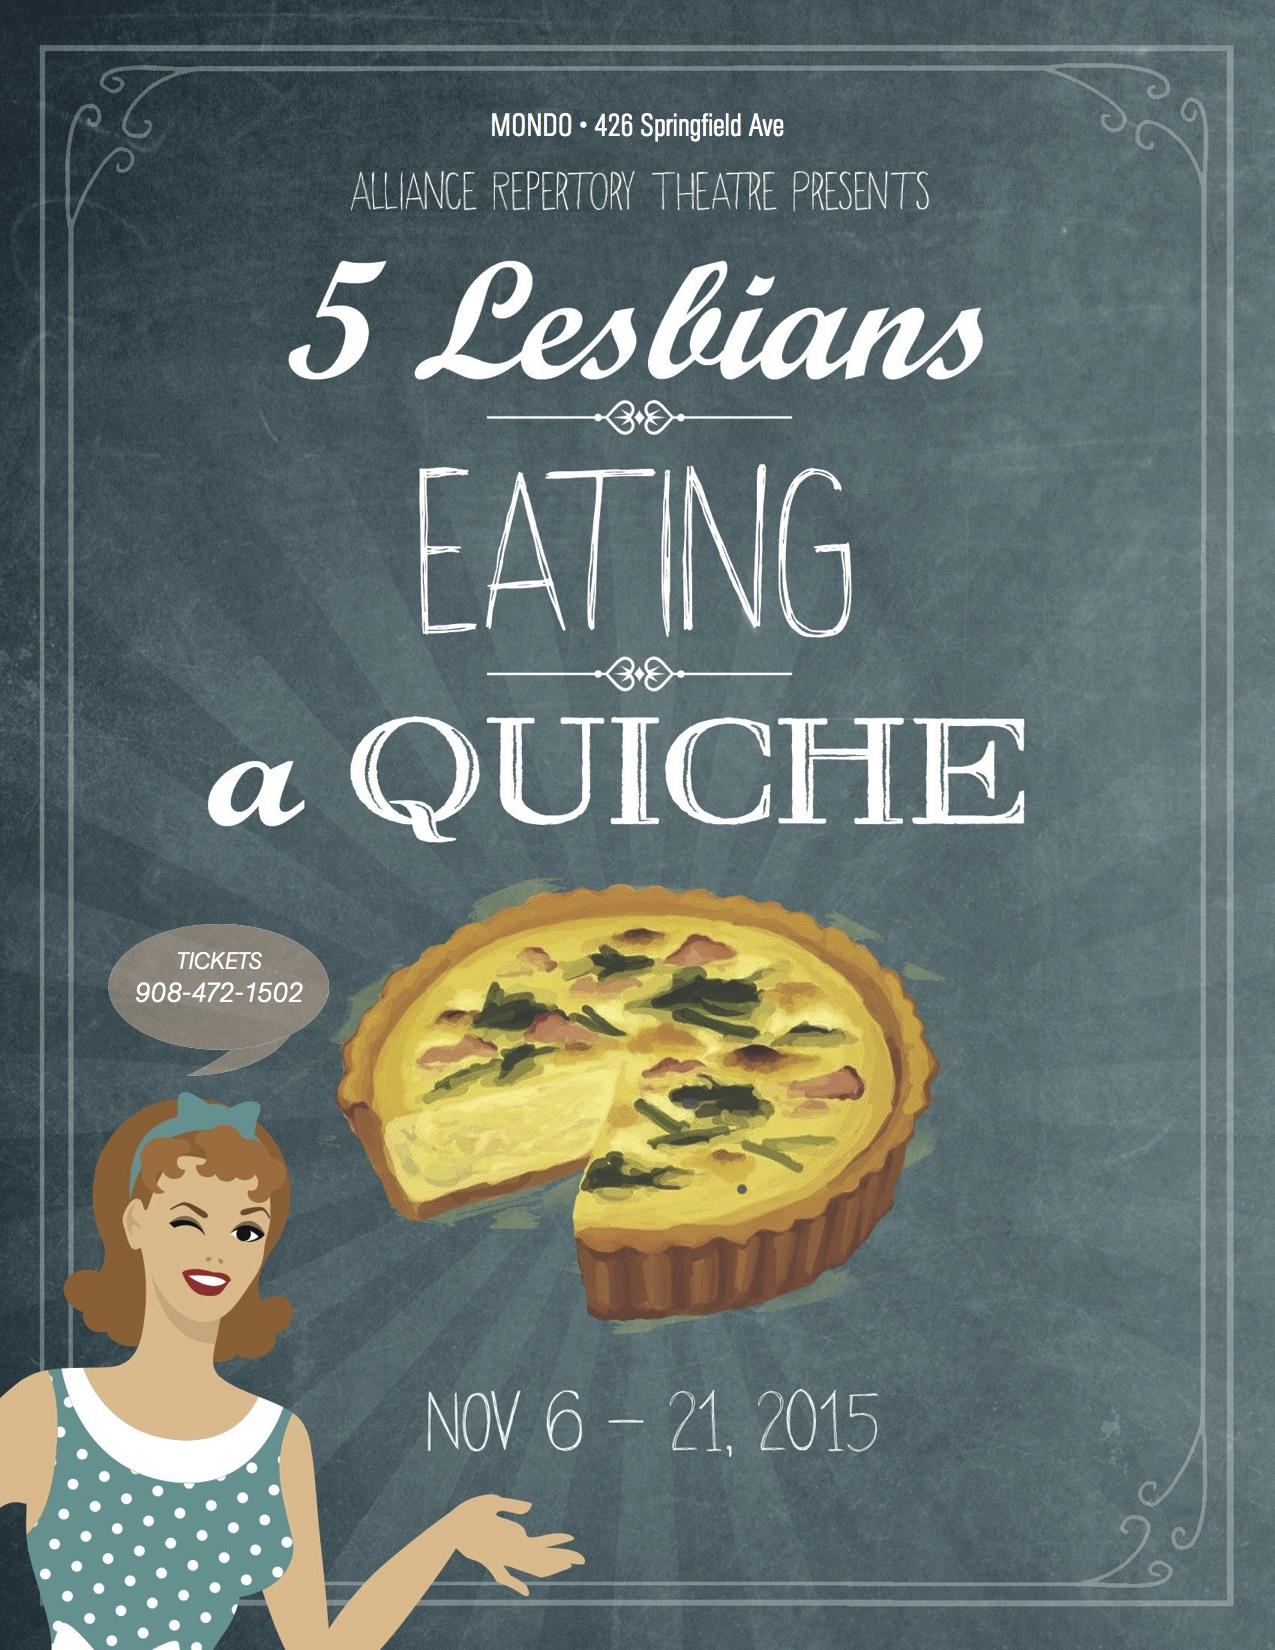 f7ee99981698f3fba337_5_Lesbians_Eatiing_Quiche.jpg